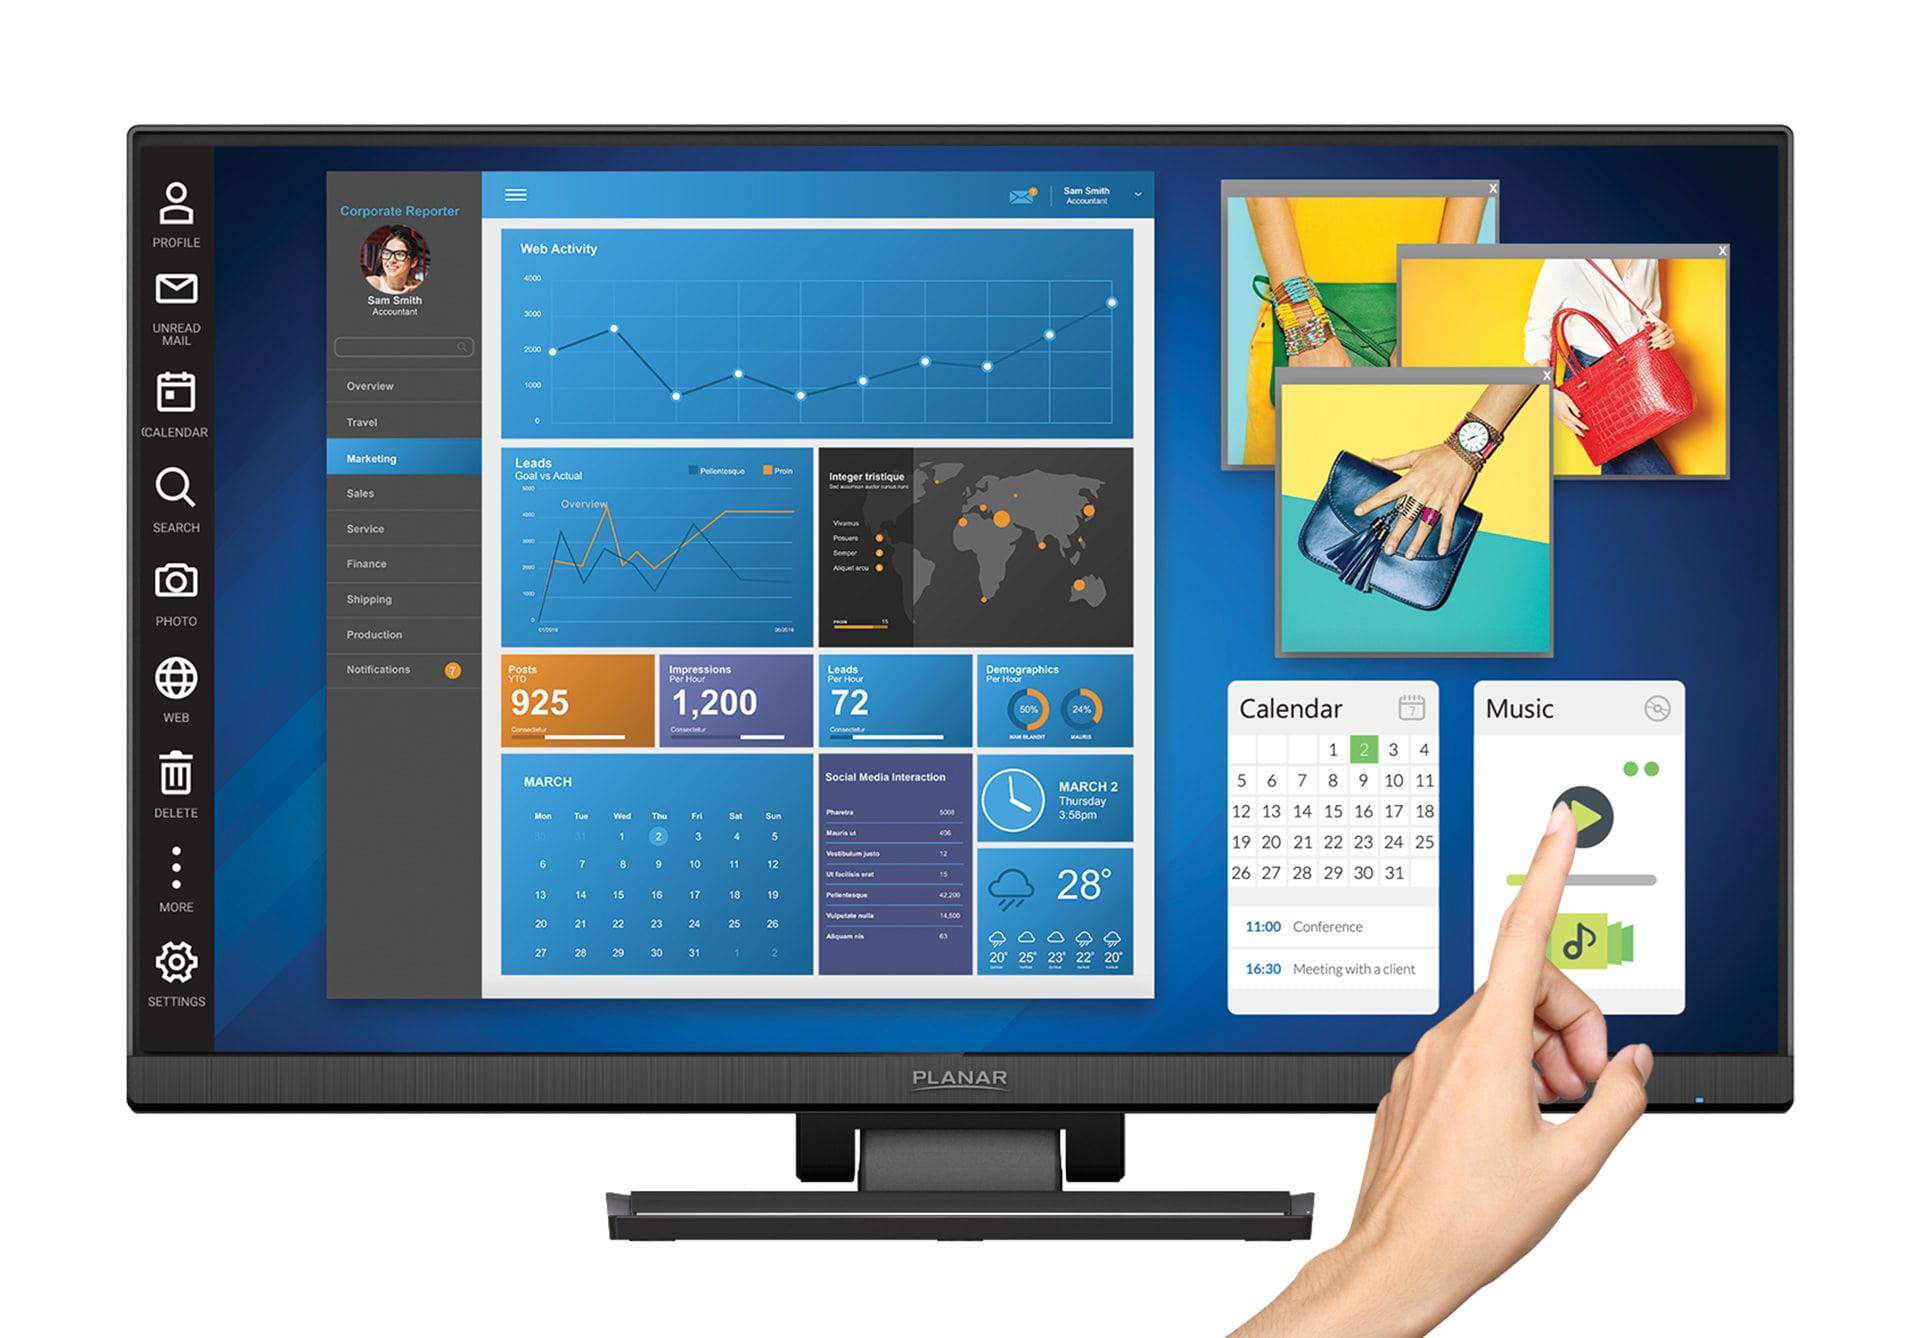 PLANAR SYSTEMS INC 997-7318-01 15IN PLL1500M BLACK ANALOG LED